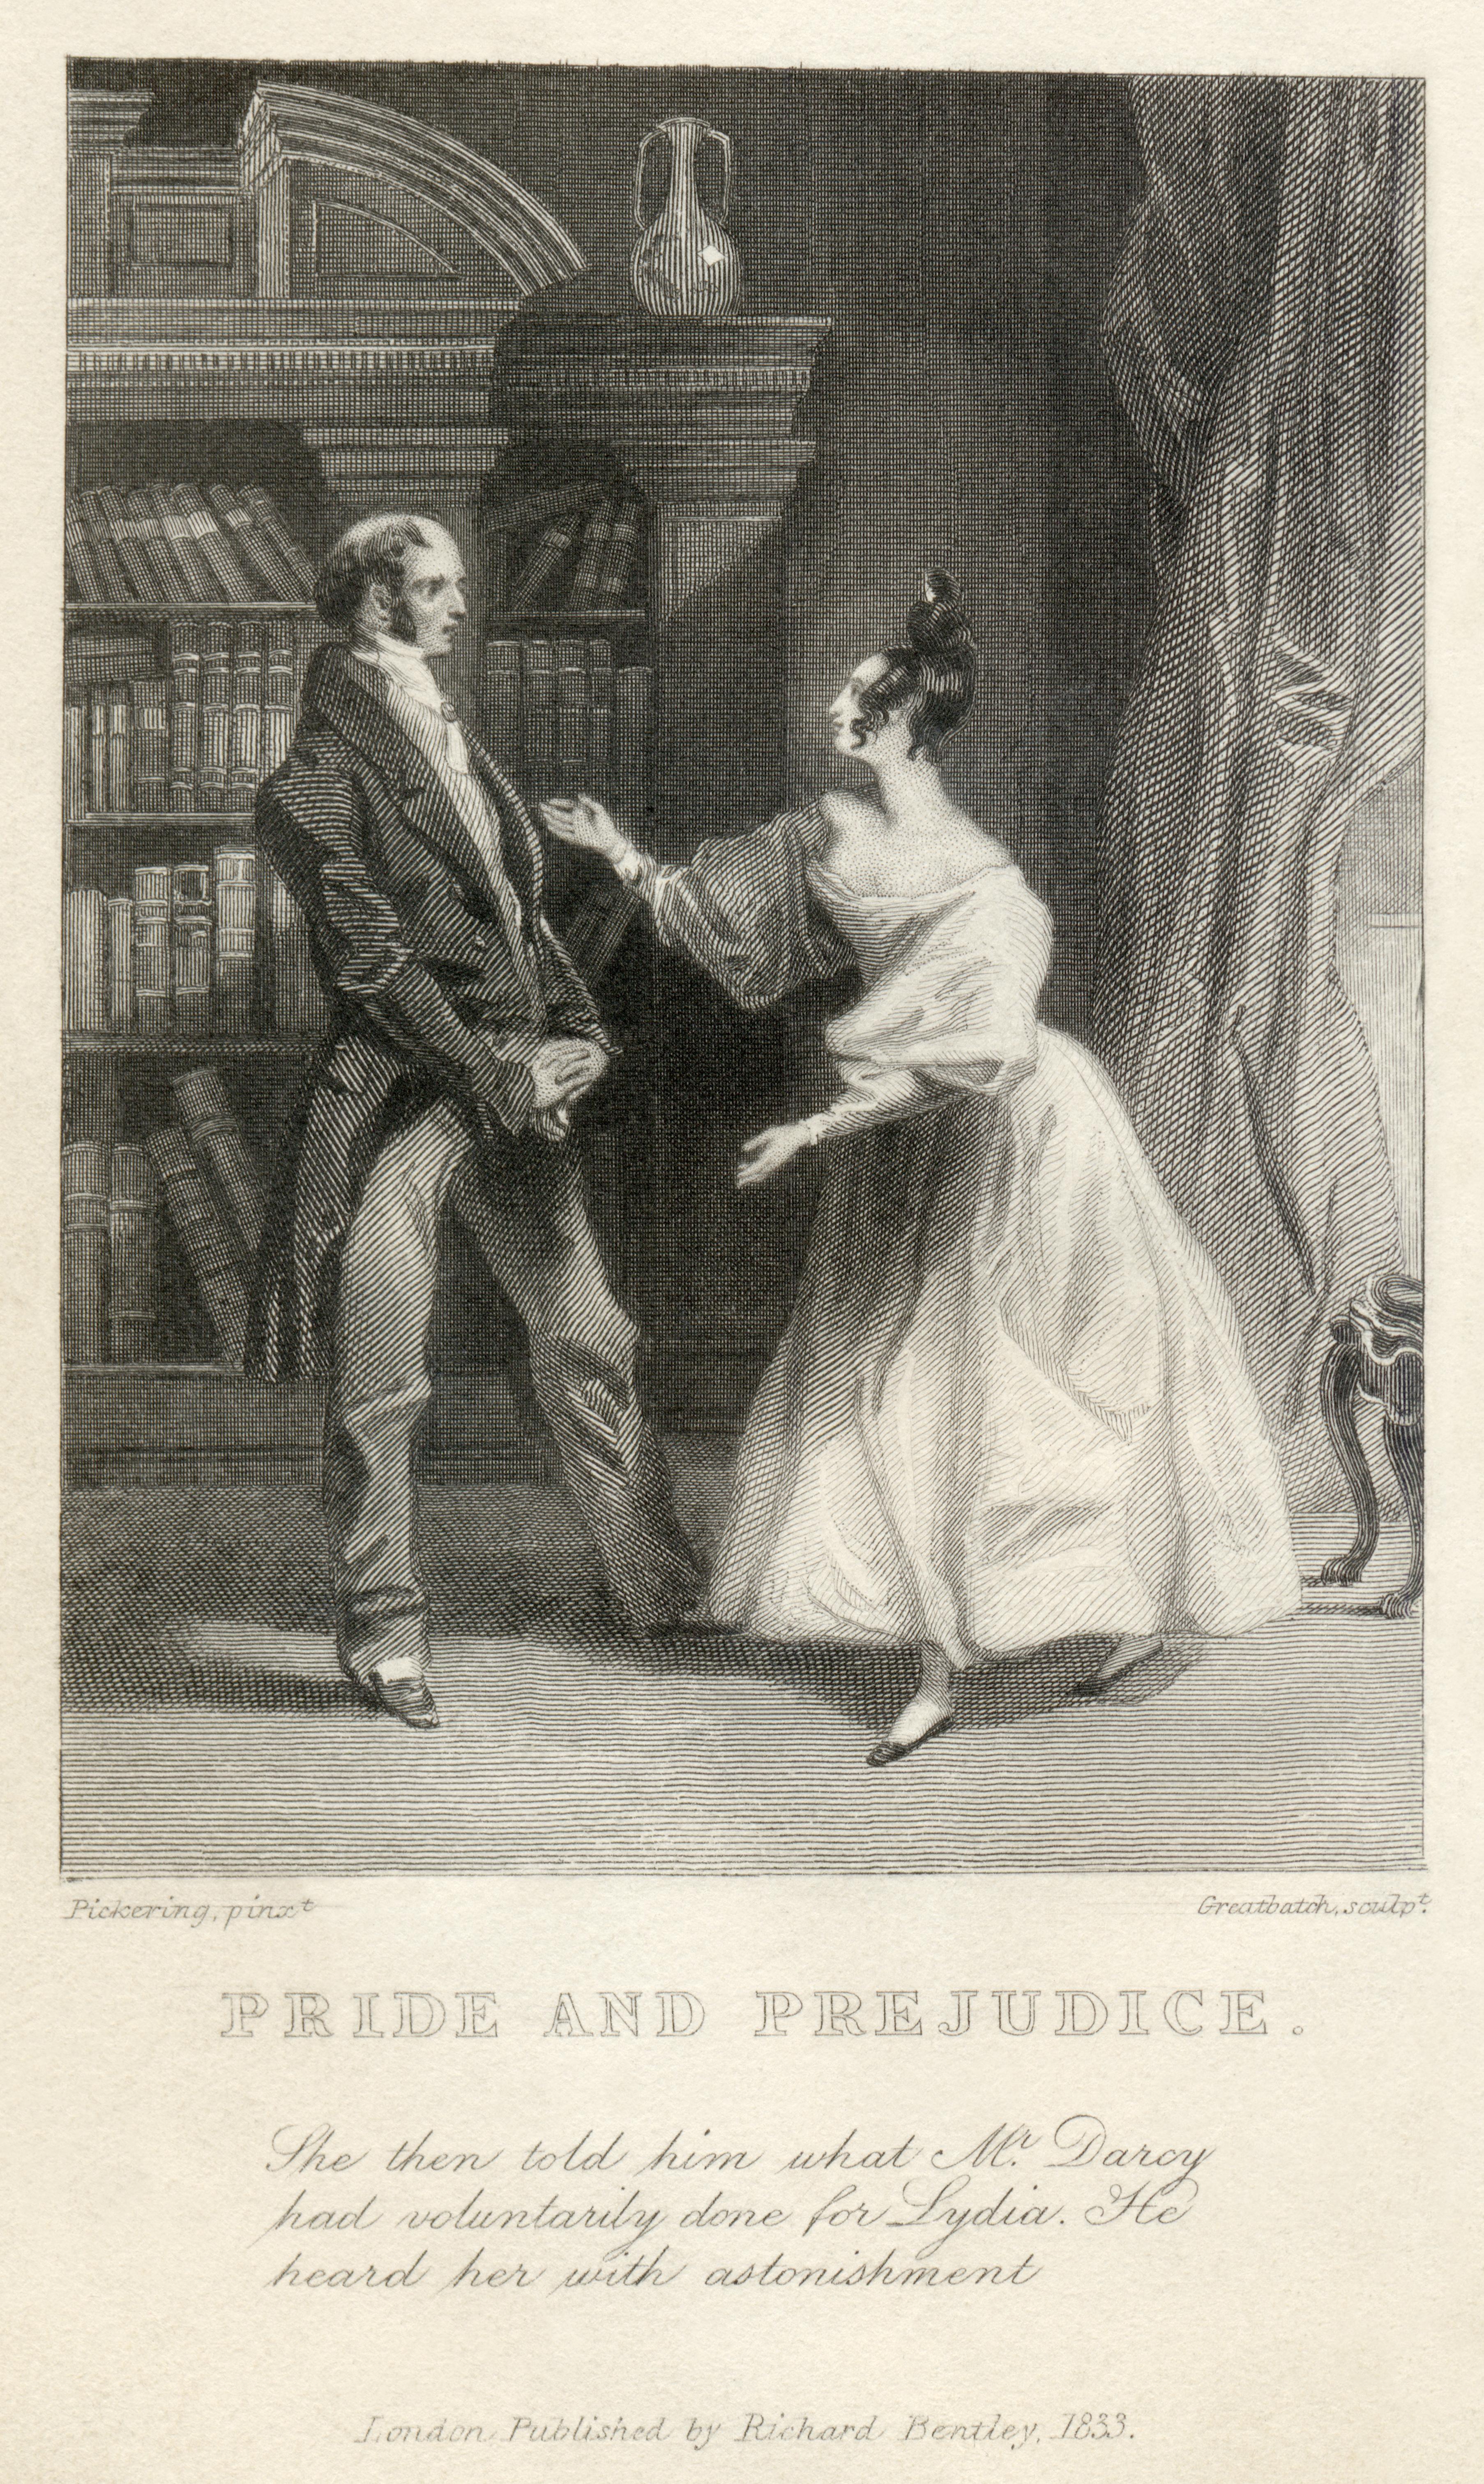 Pickering & Greatbach - <em>Pride and Prejudice</em>, a novel by Jane Austen